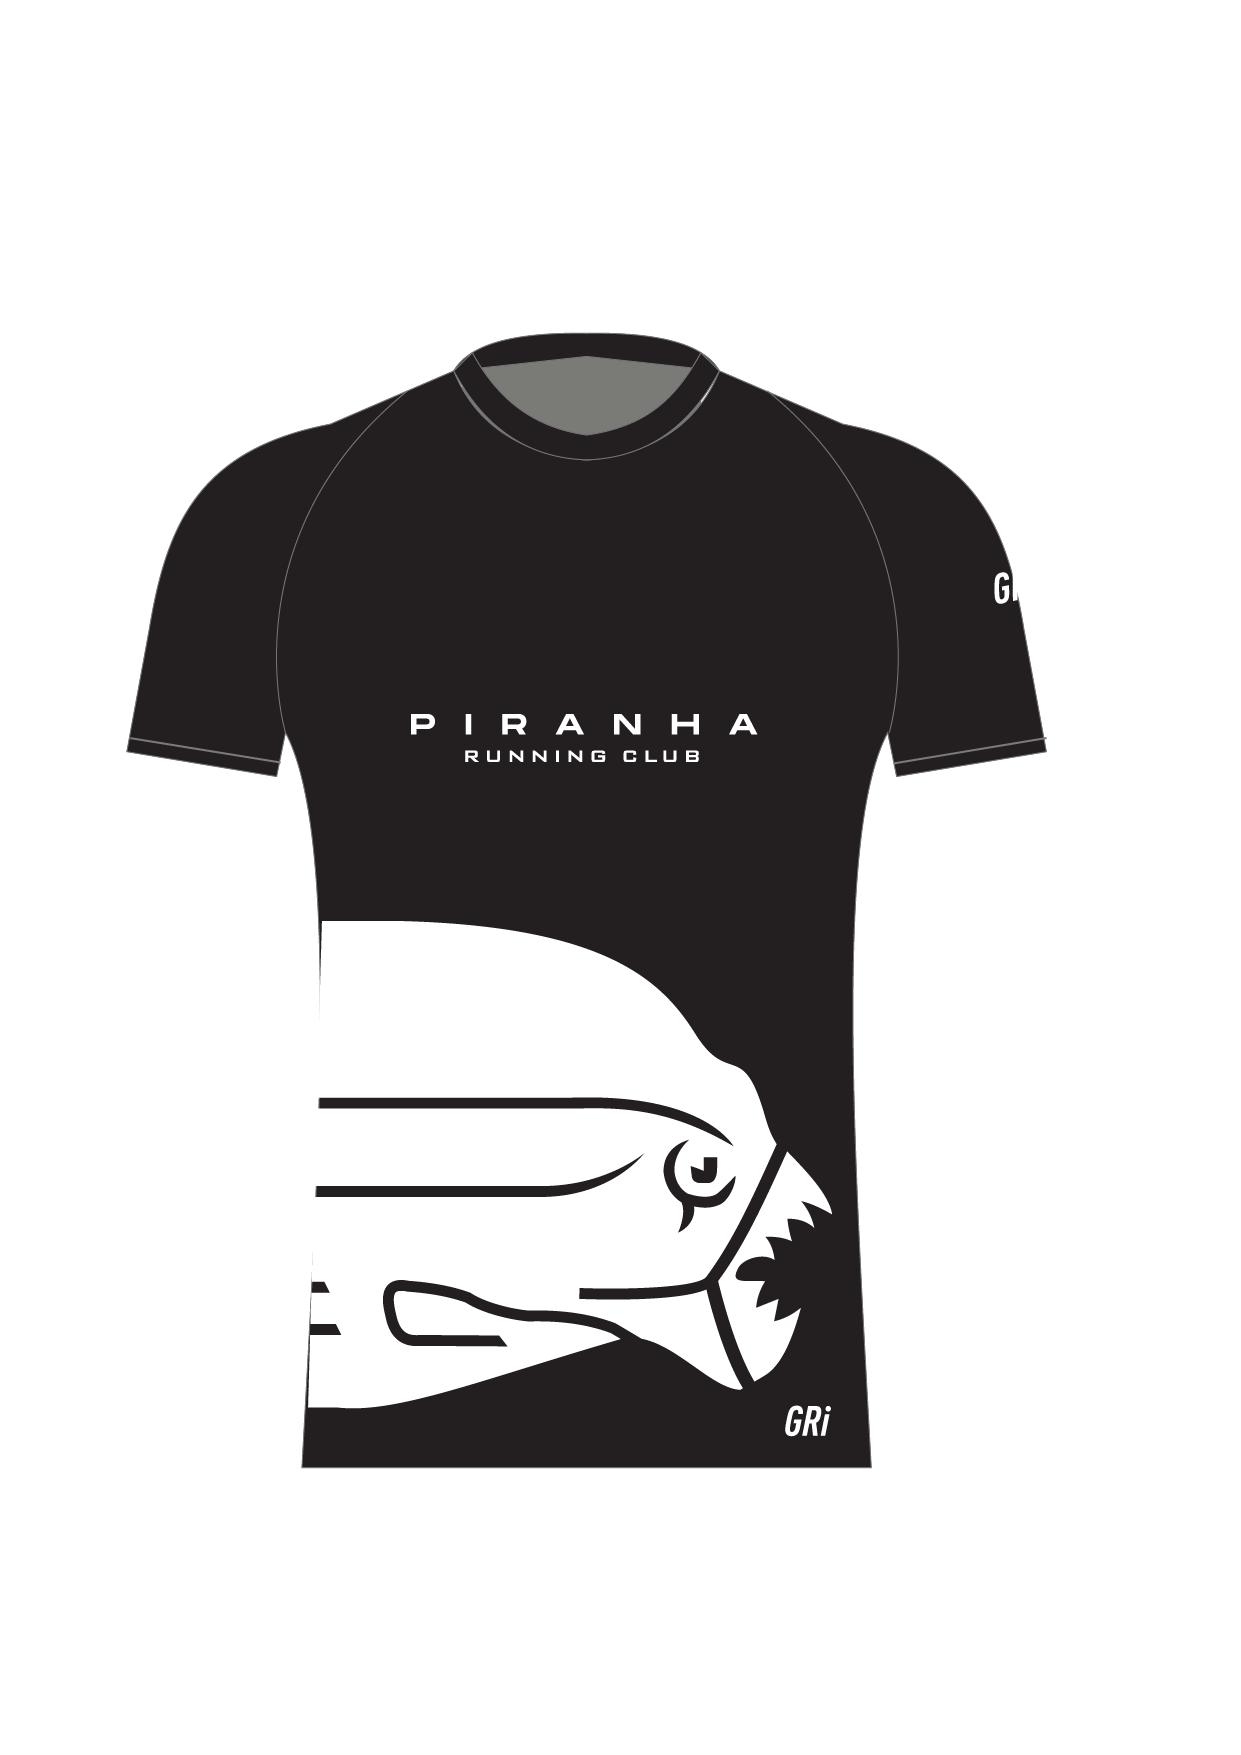 Футболка клубная, Gri Piranha, черная, мужская